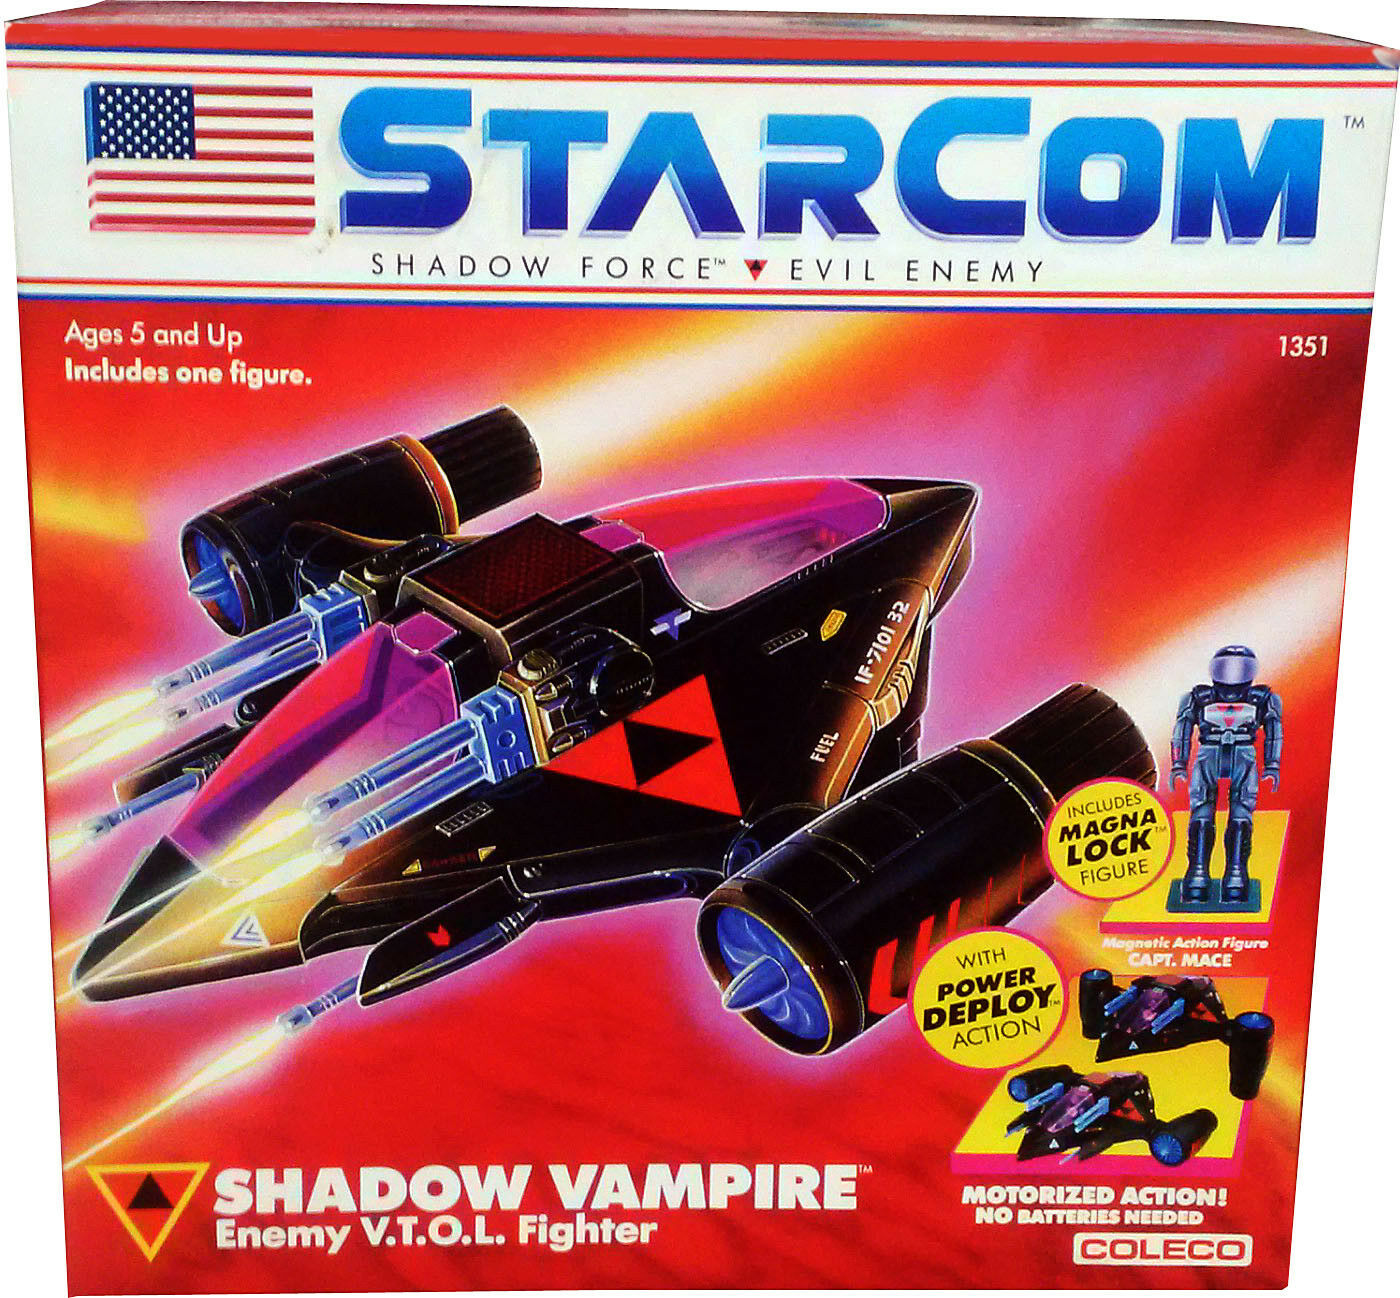 StarCom Shadow Vampire Enemy V.T.O.L. Fighter - Vintage 1986 - MISB New  AFA IT